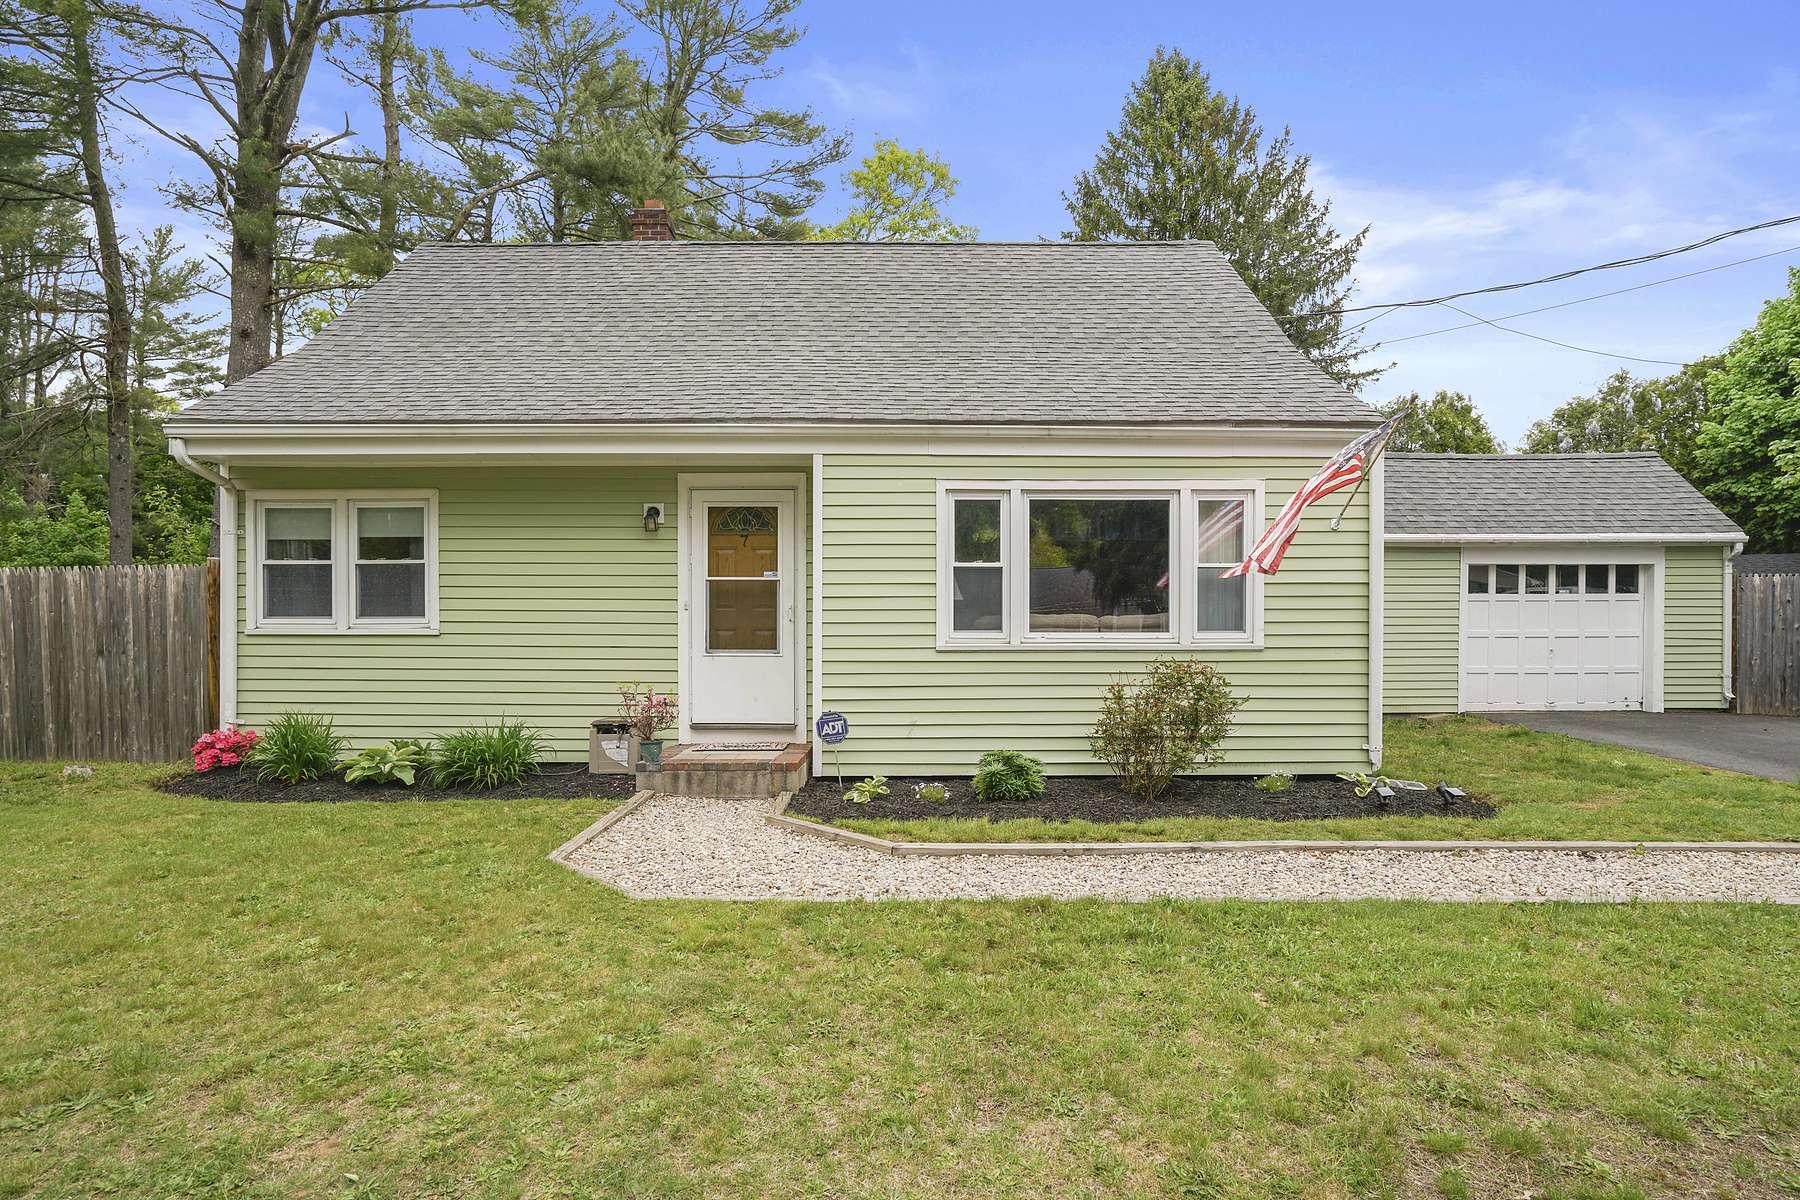 Single Family Homes for Active at Cape 7 Grove St Kingston, Massachusetts 02364 United States